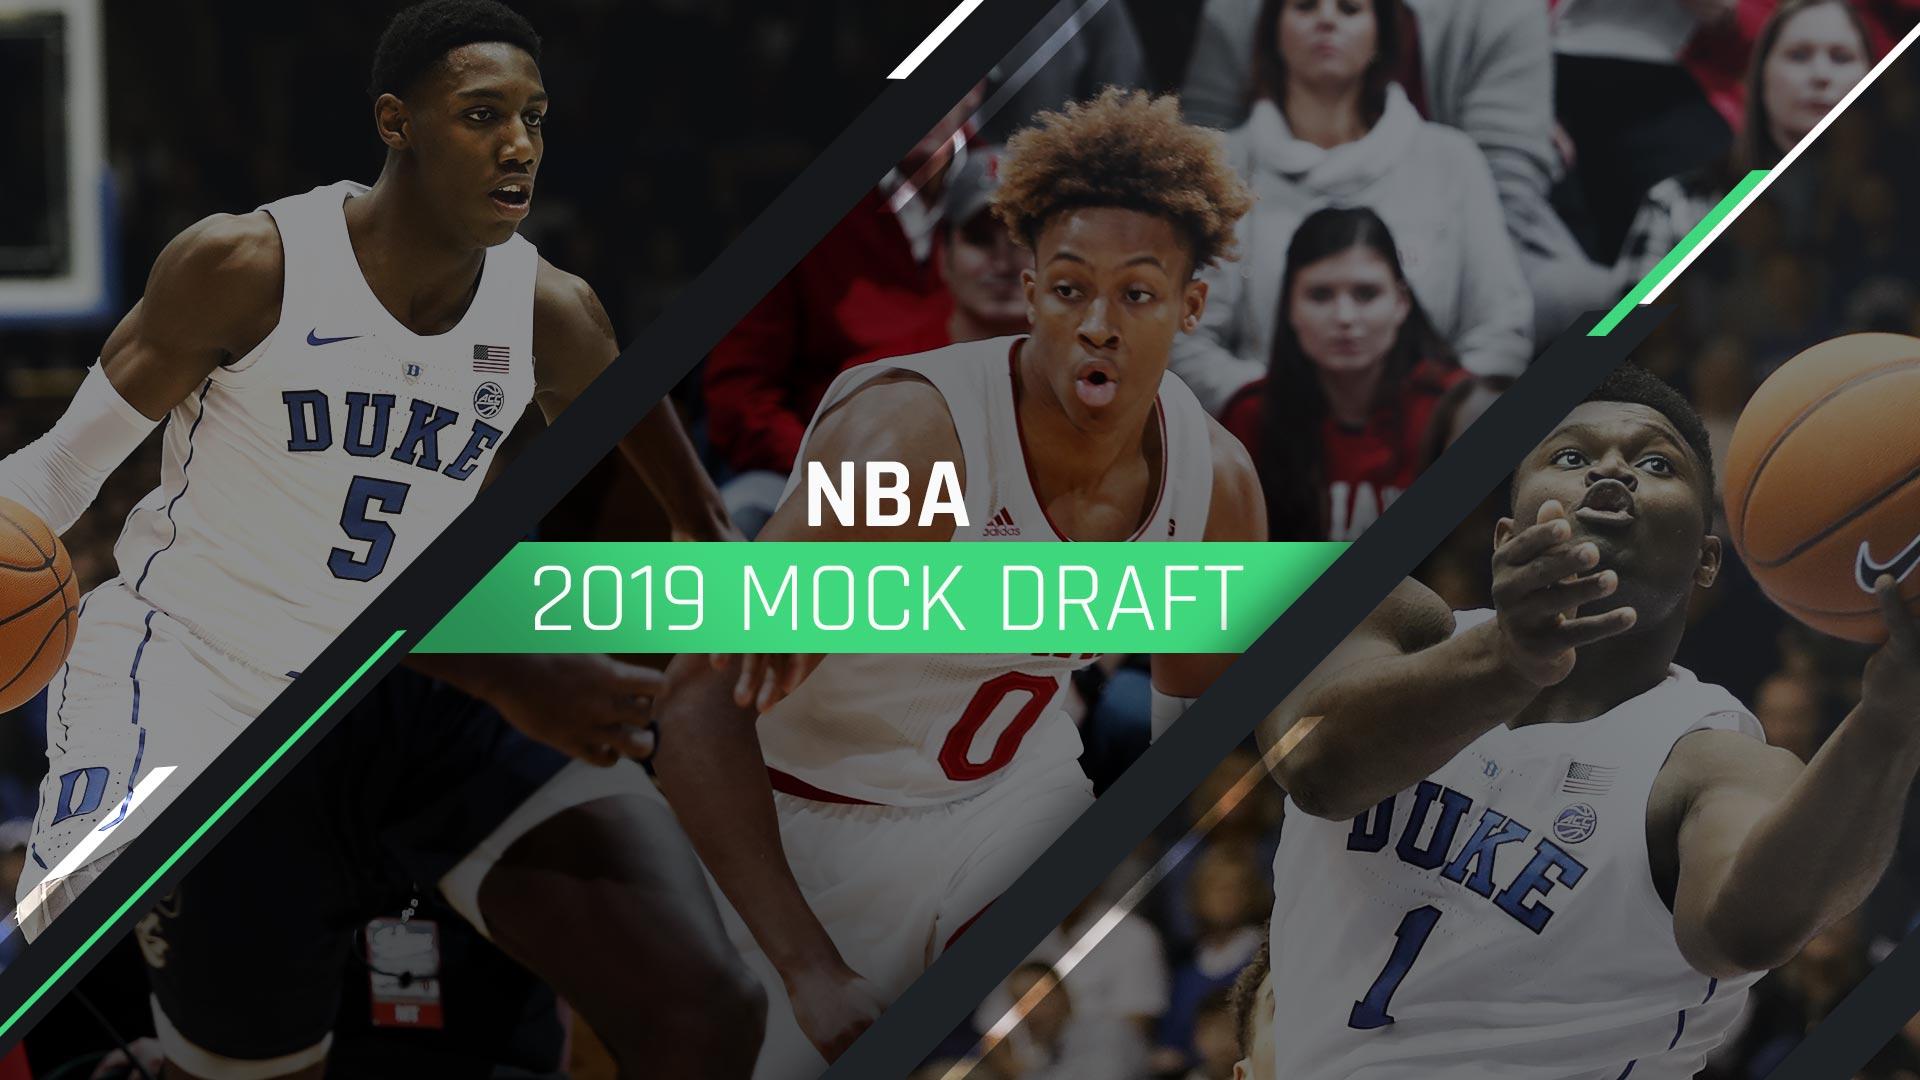 nba mock draft 2019 post